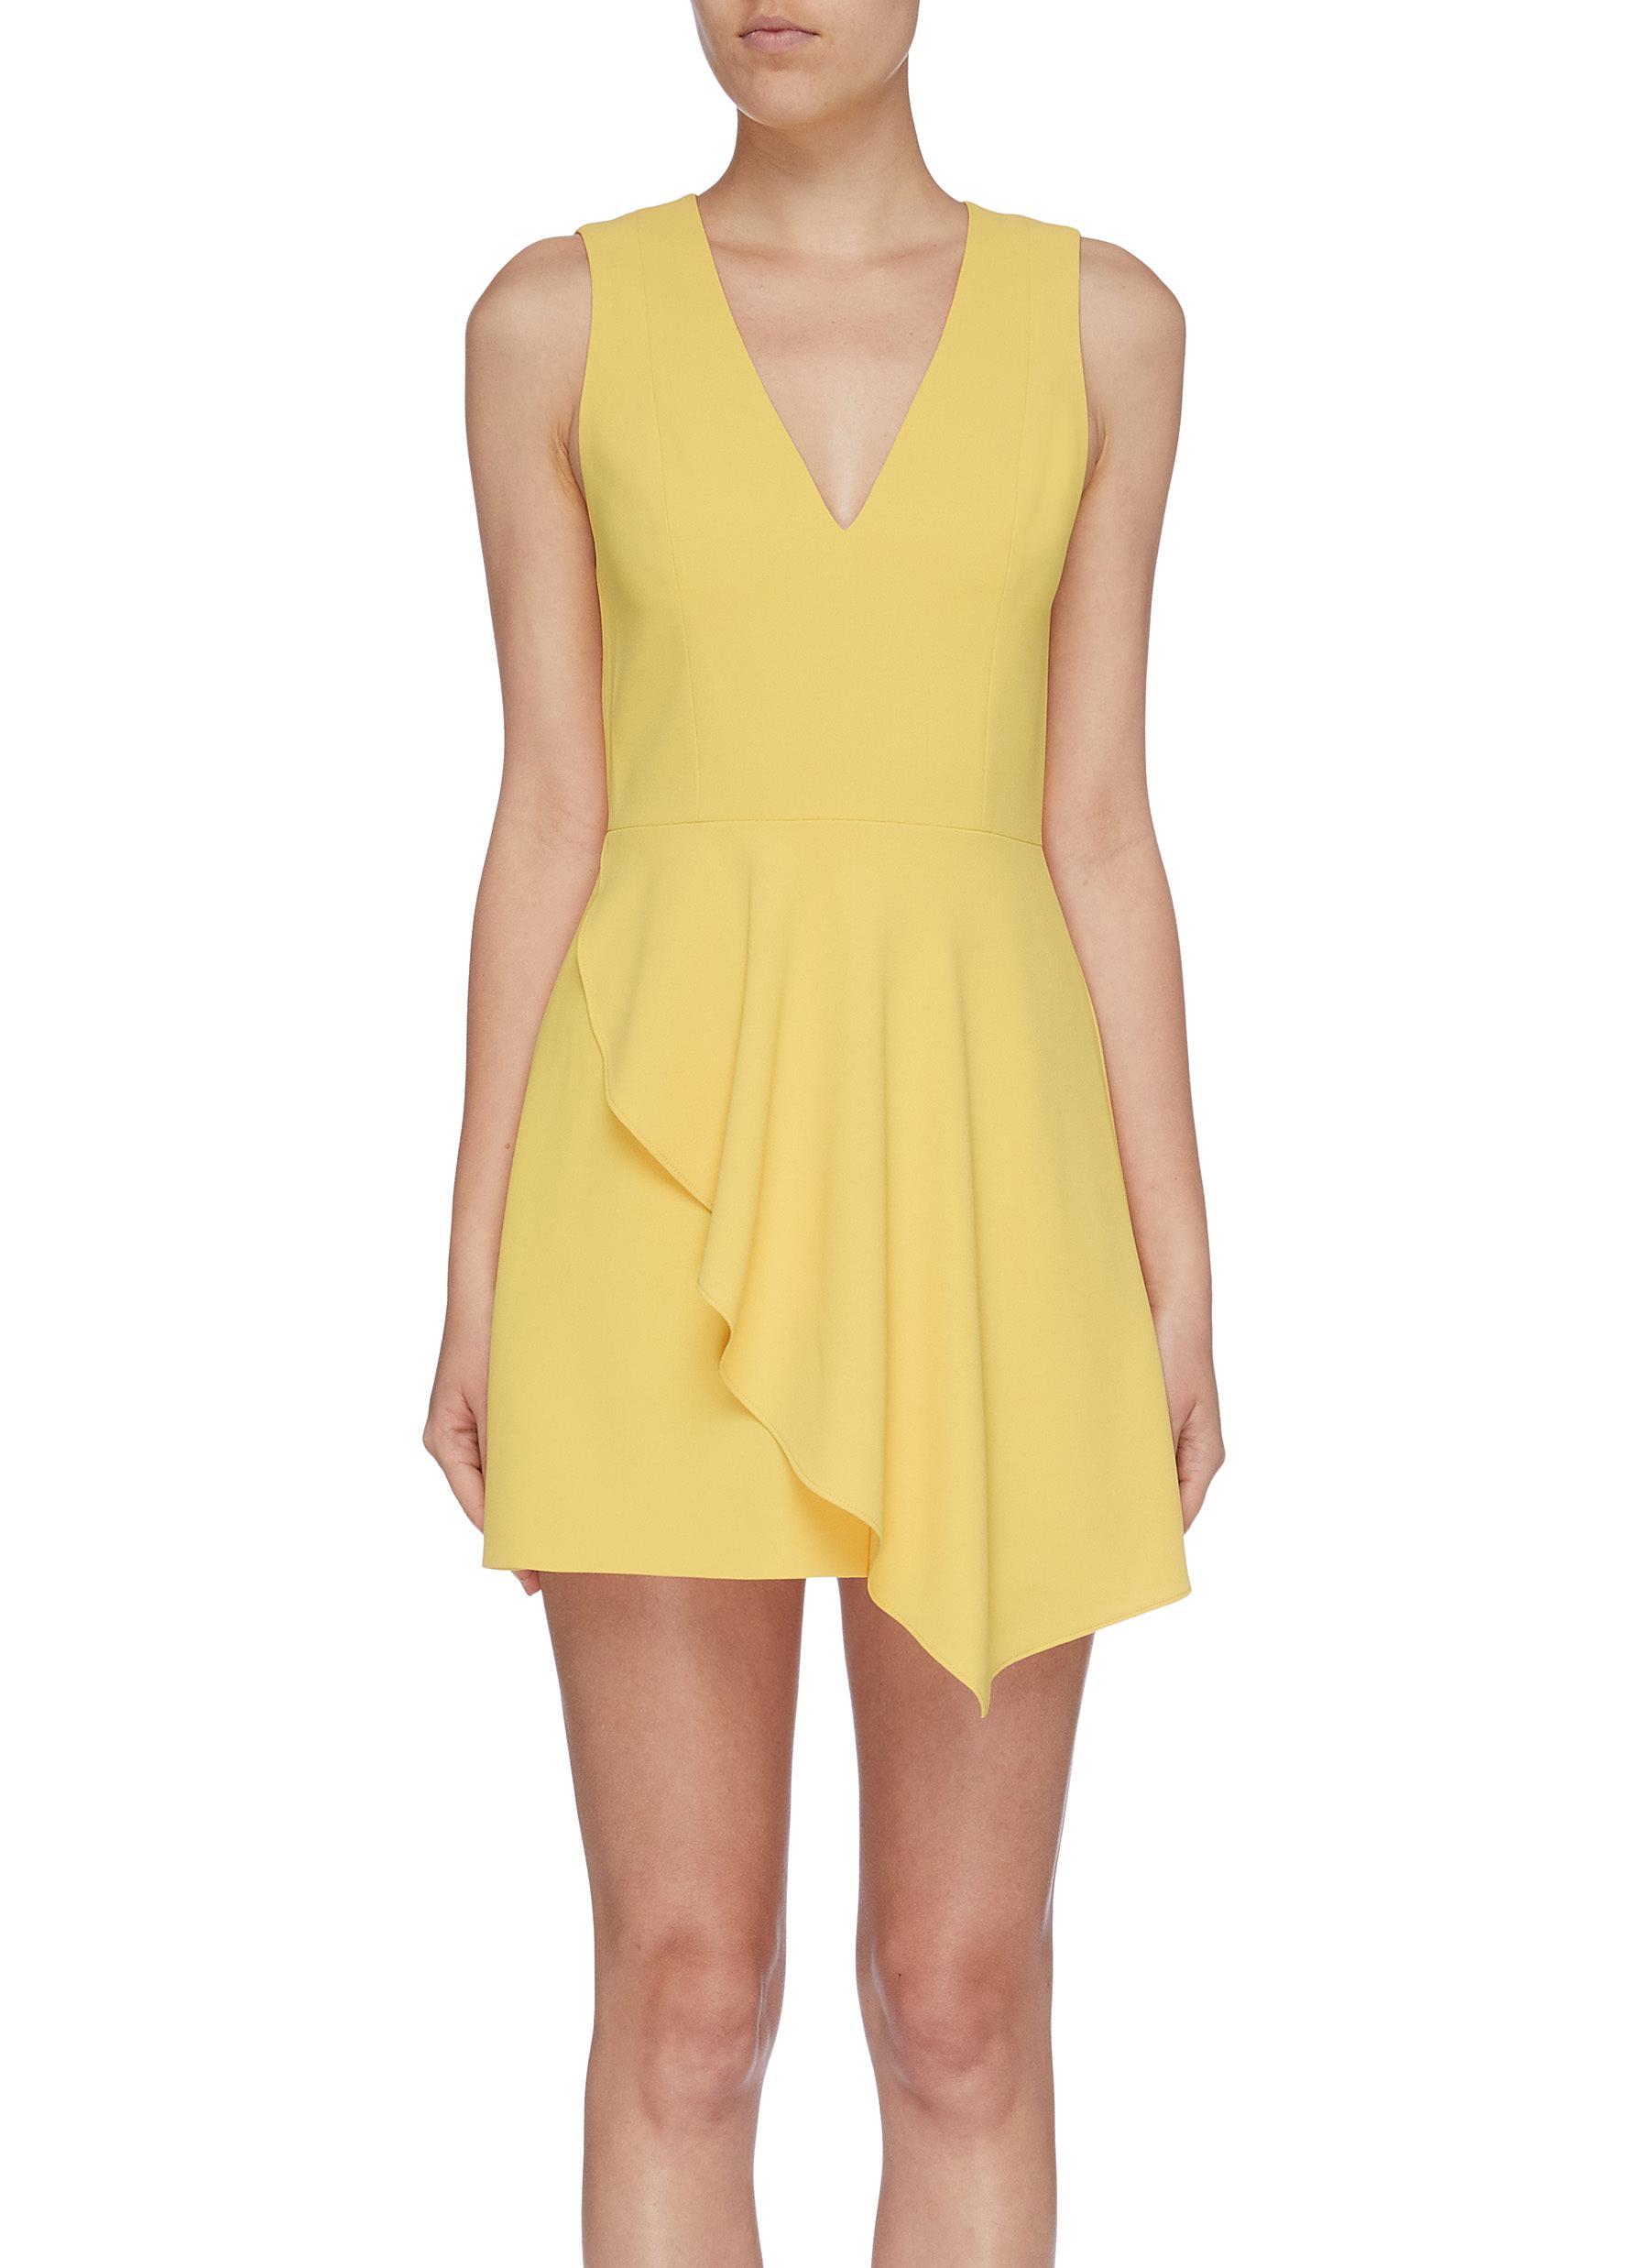 Callie asymmetric ruffle sleeveless crepe dress by Alice + Olivia